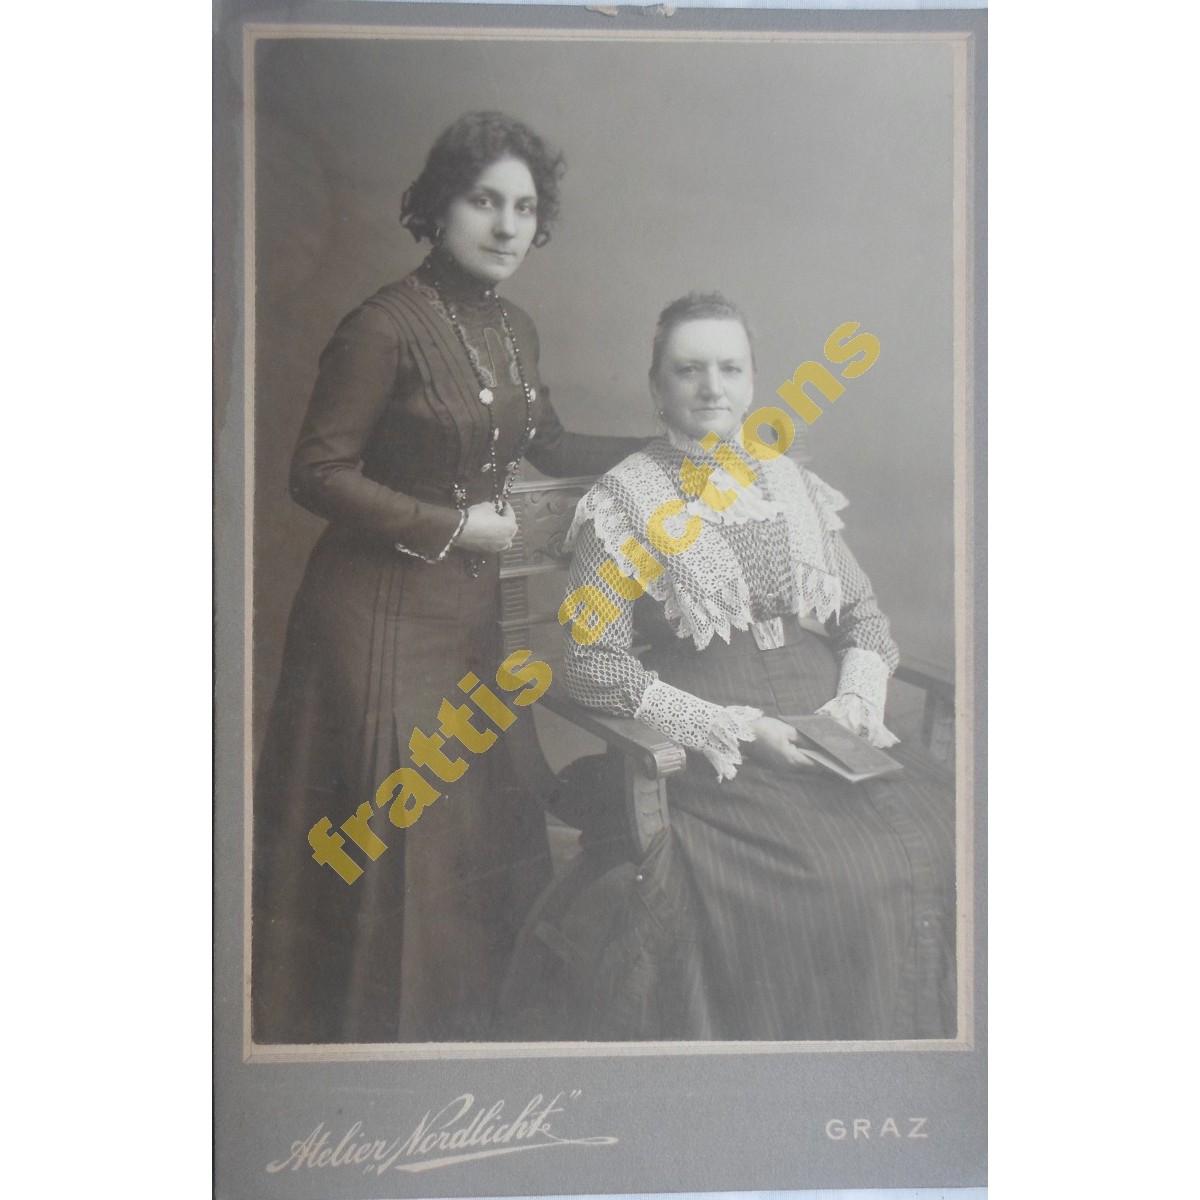 Cabinet, δύο γυναικών, Ατελιέ Νόρλιχτ, Γκραντζ.